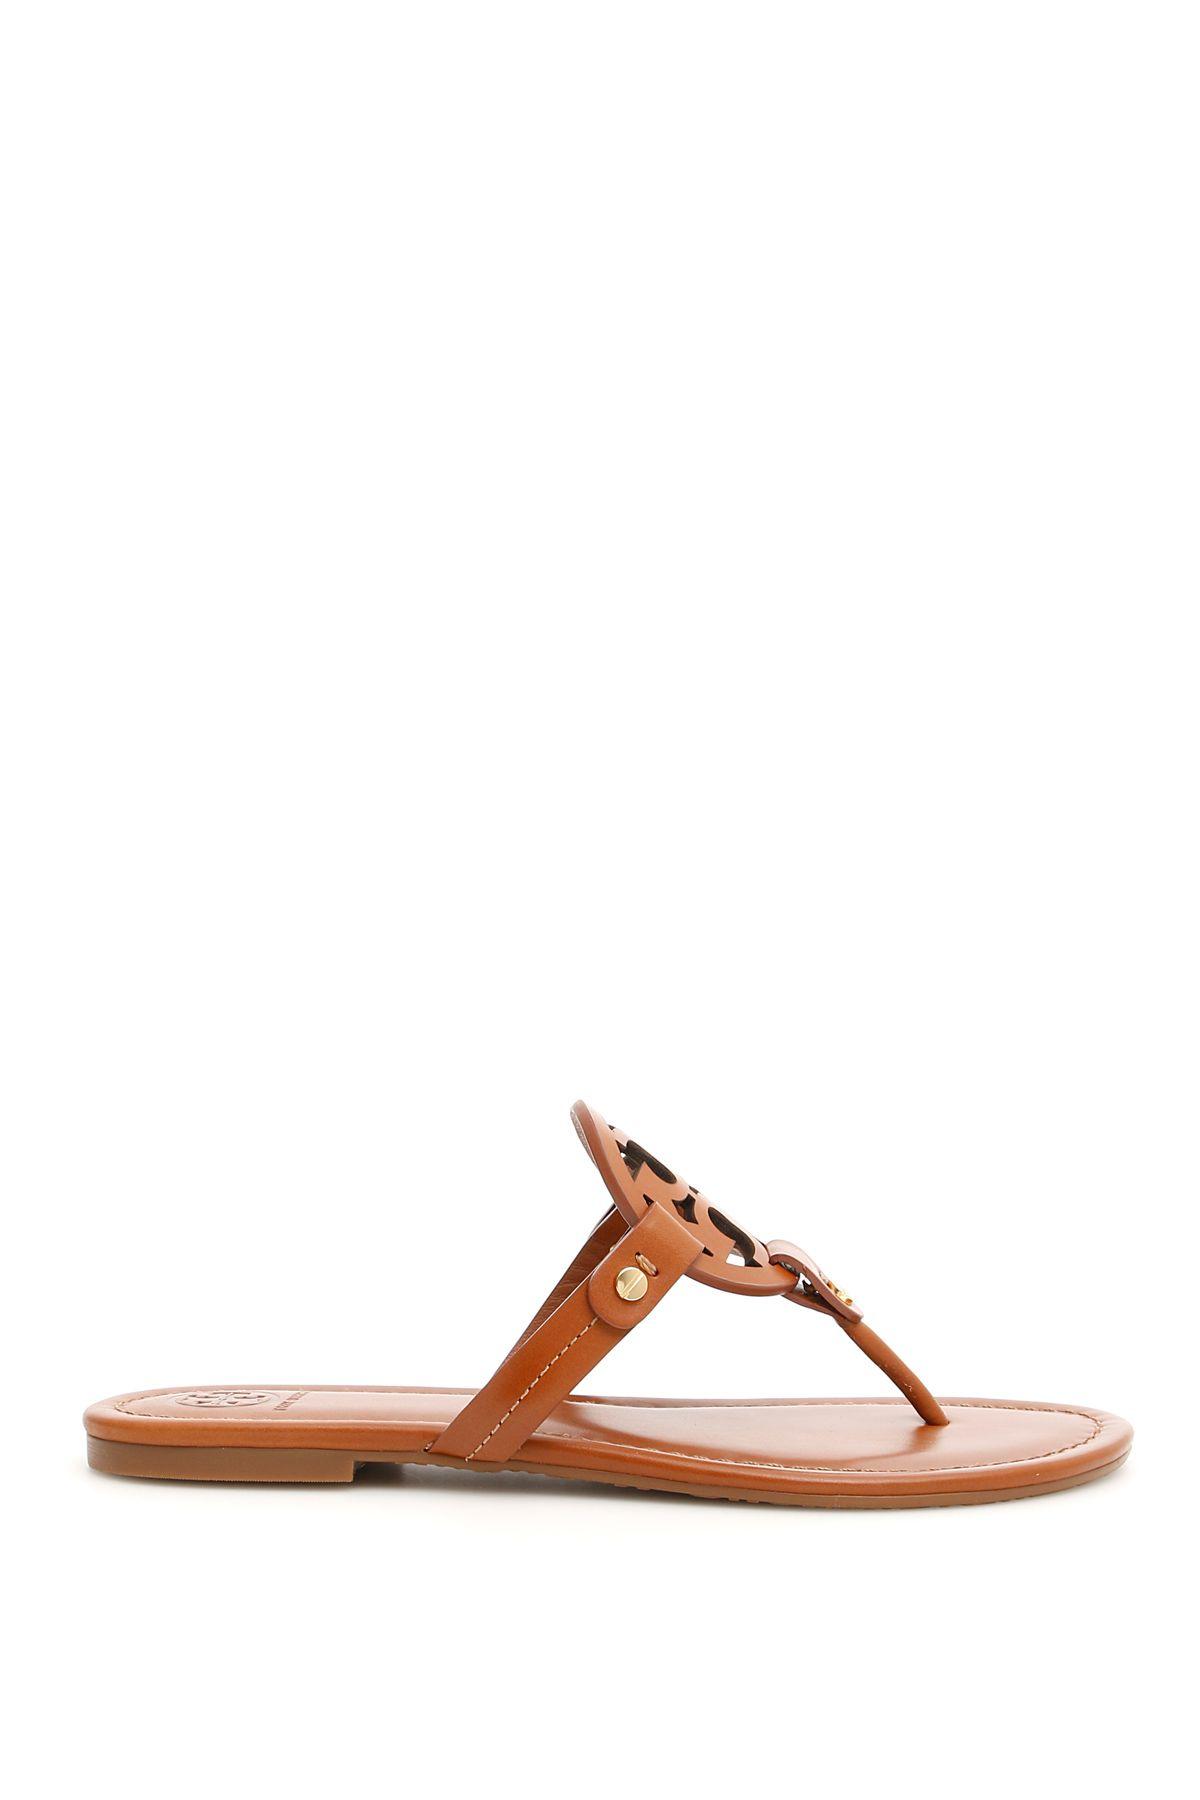 7b1f3f90889f4e Tory Burch Miller Sandals In Vintage Vachetta